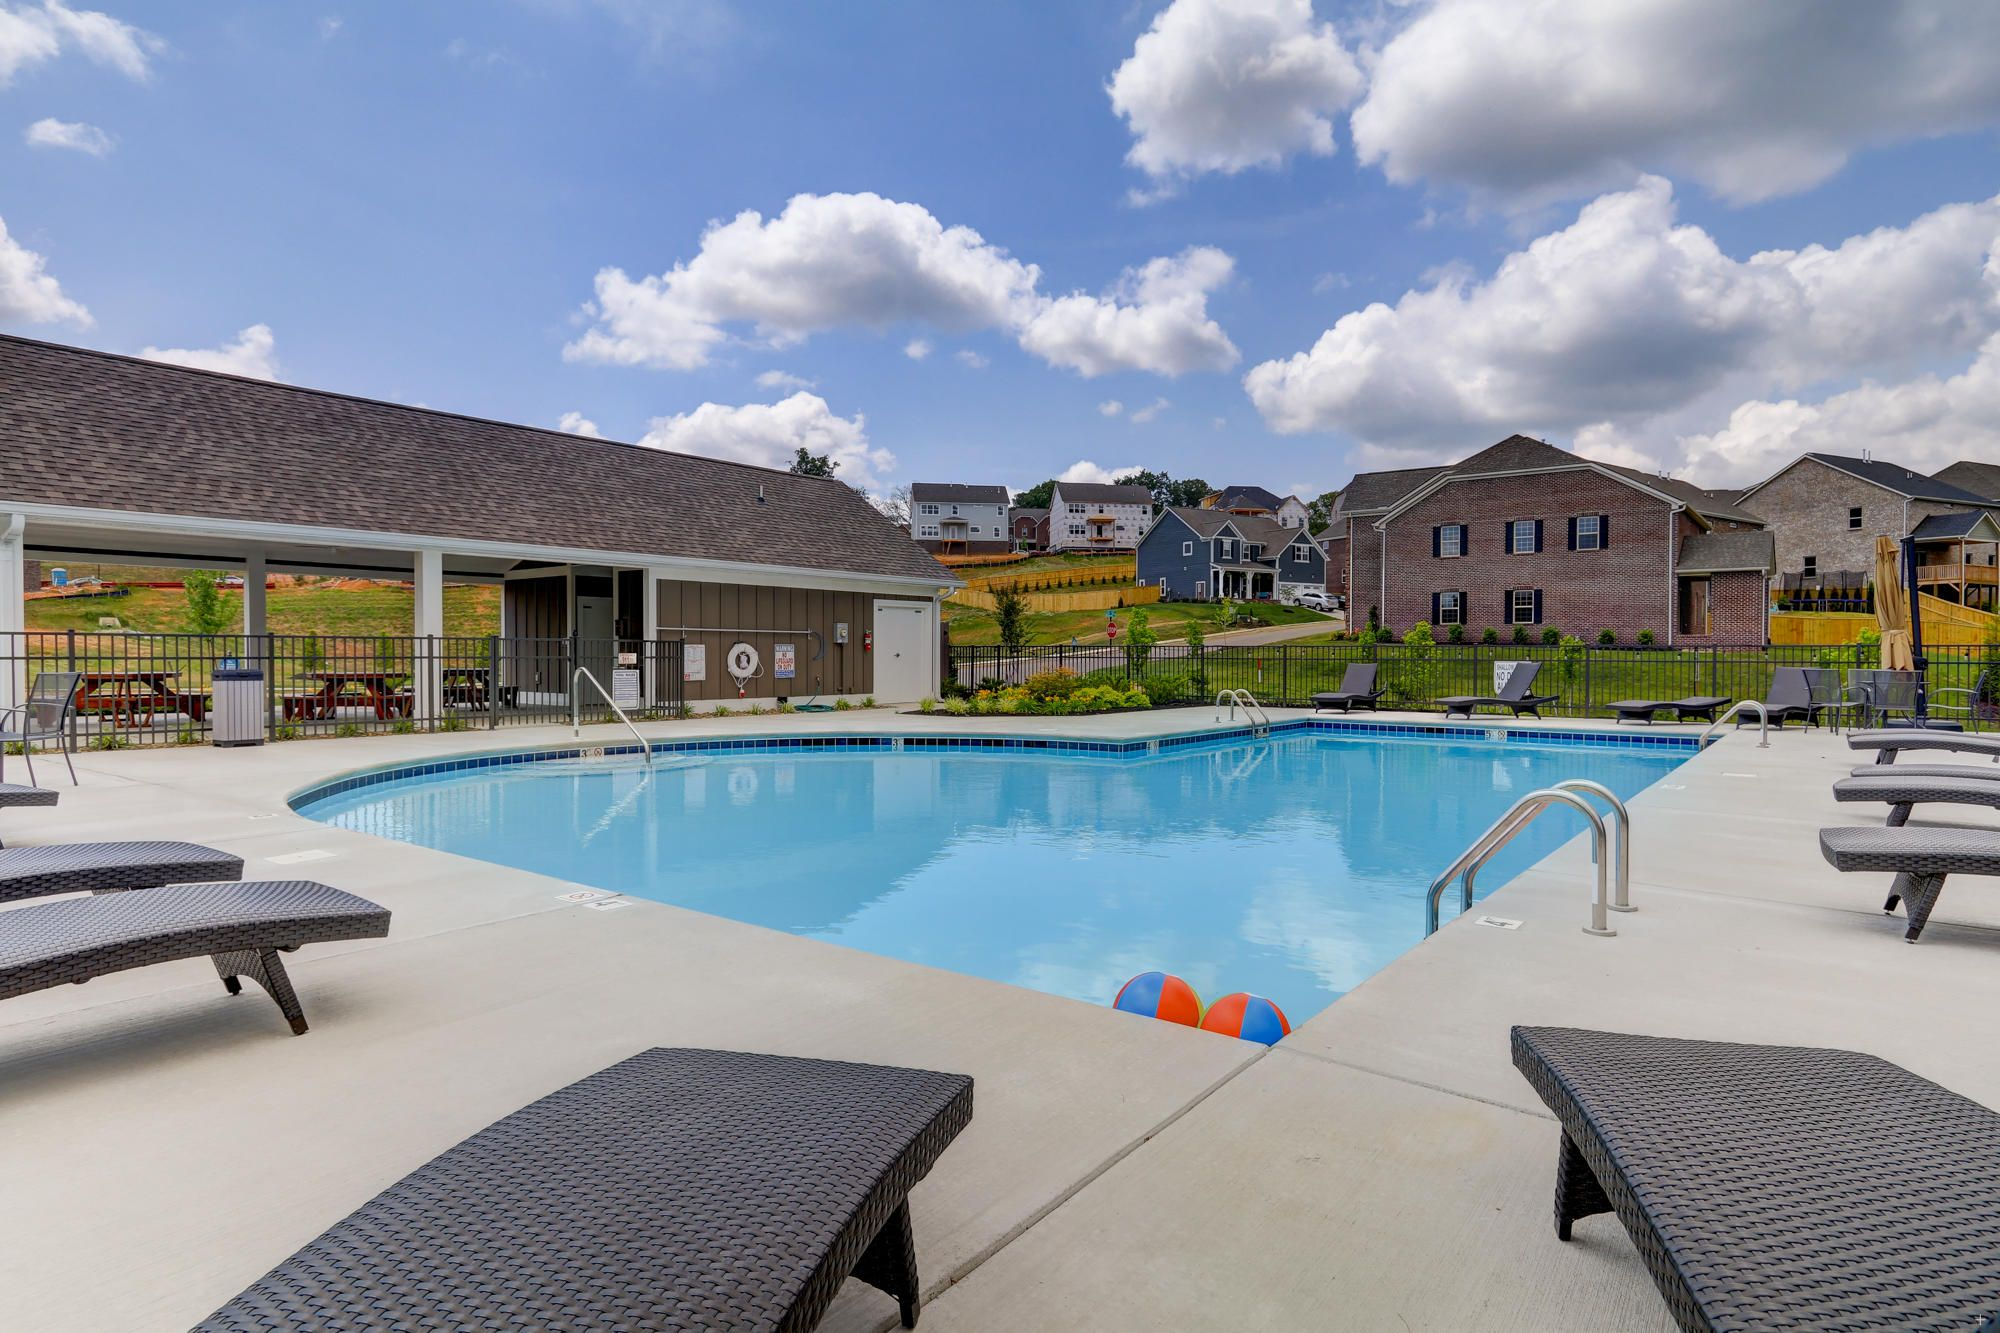 HH Pool & Pavilion